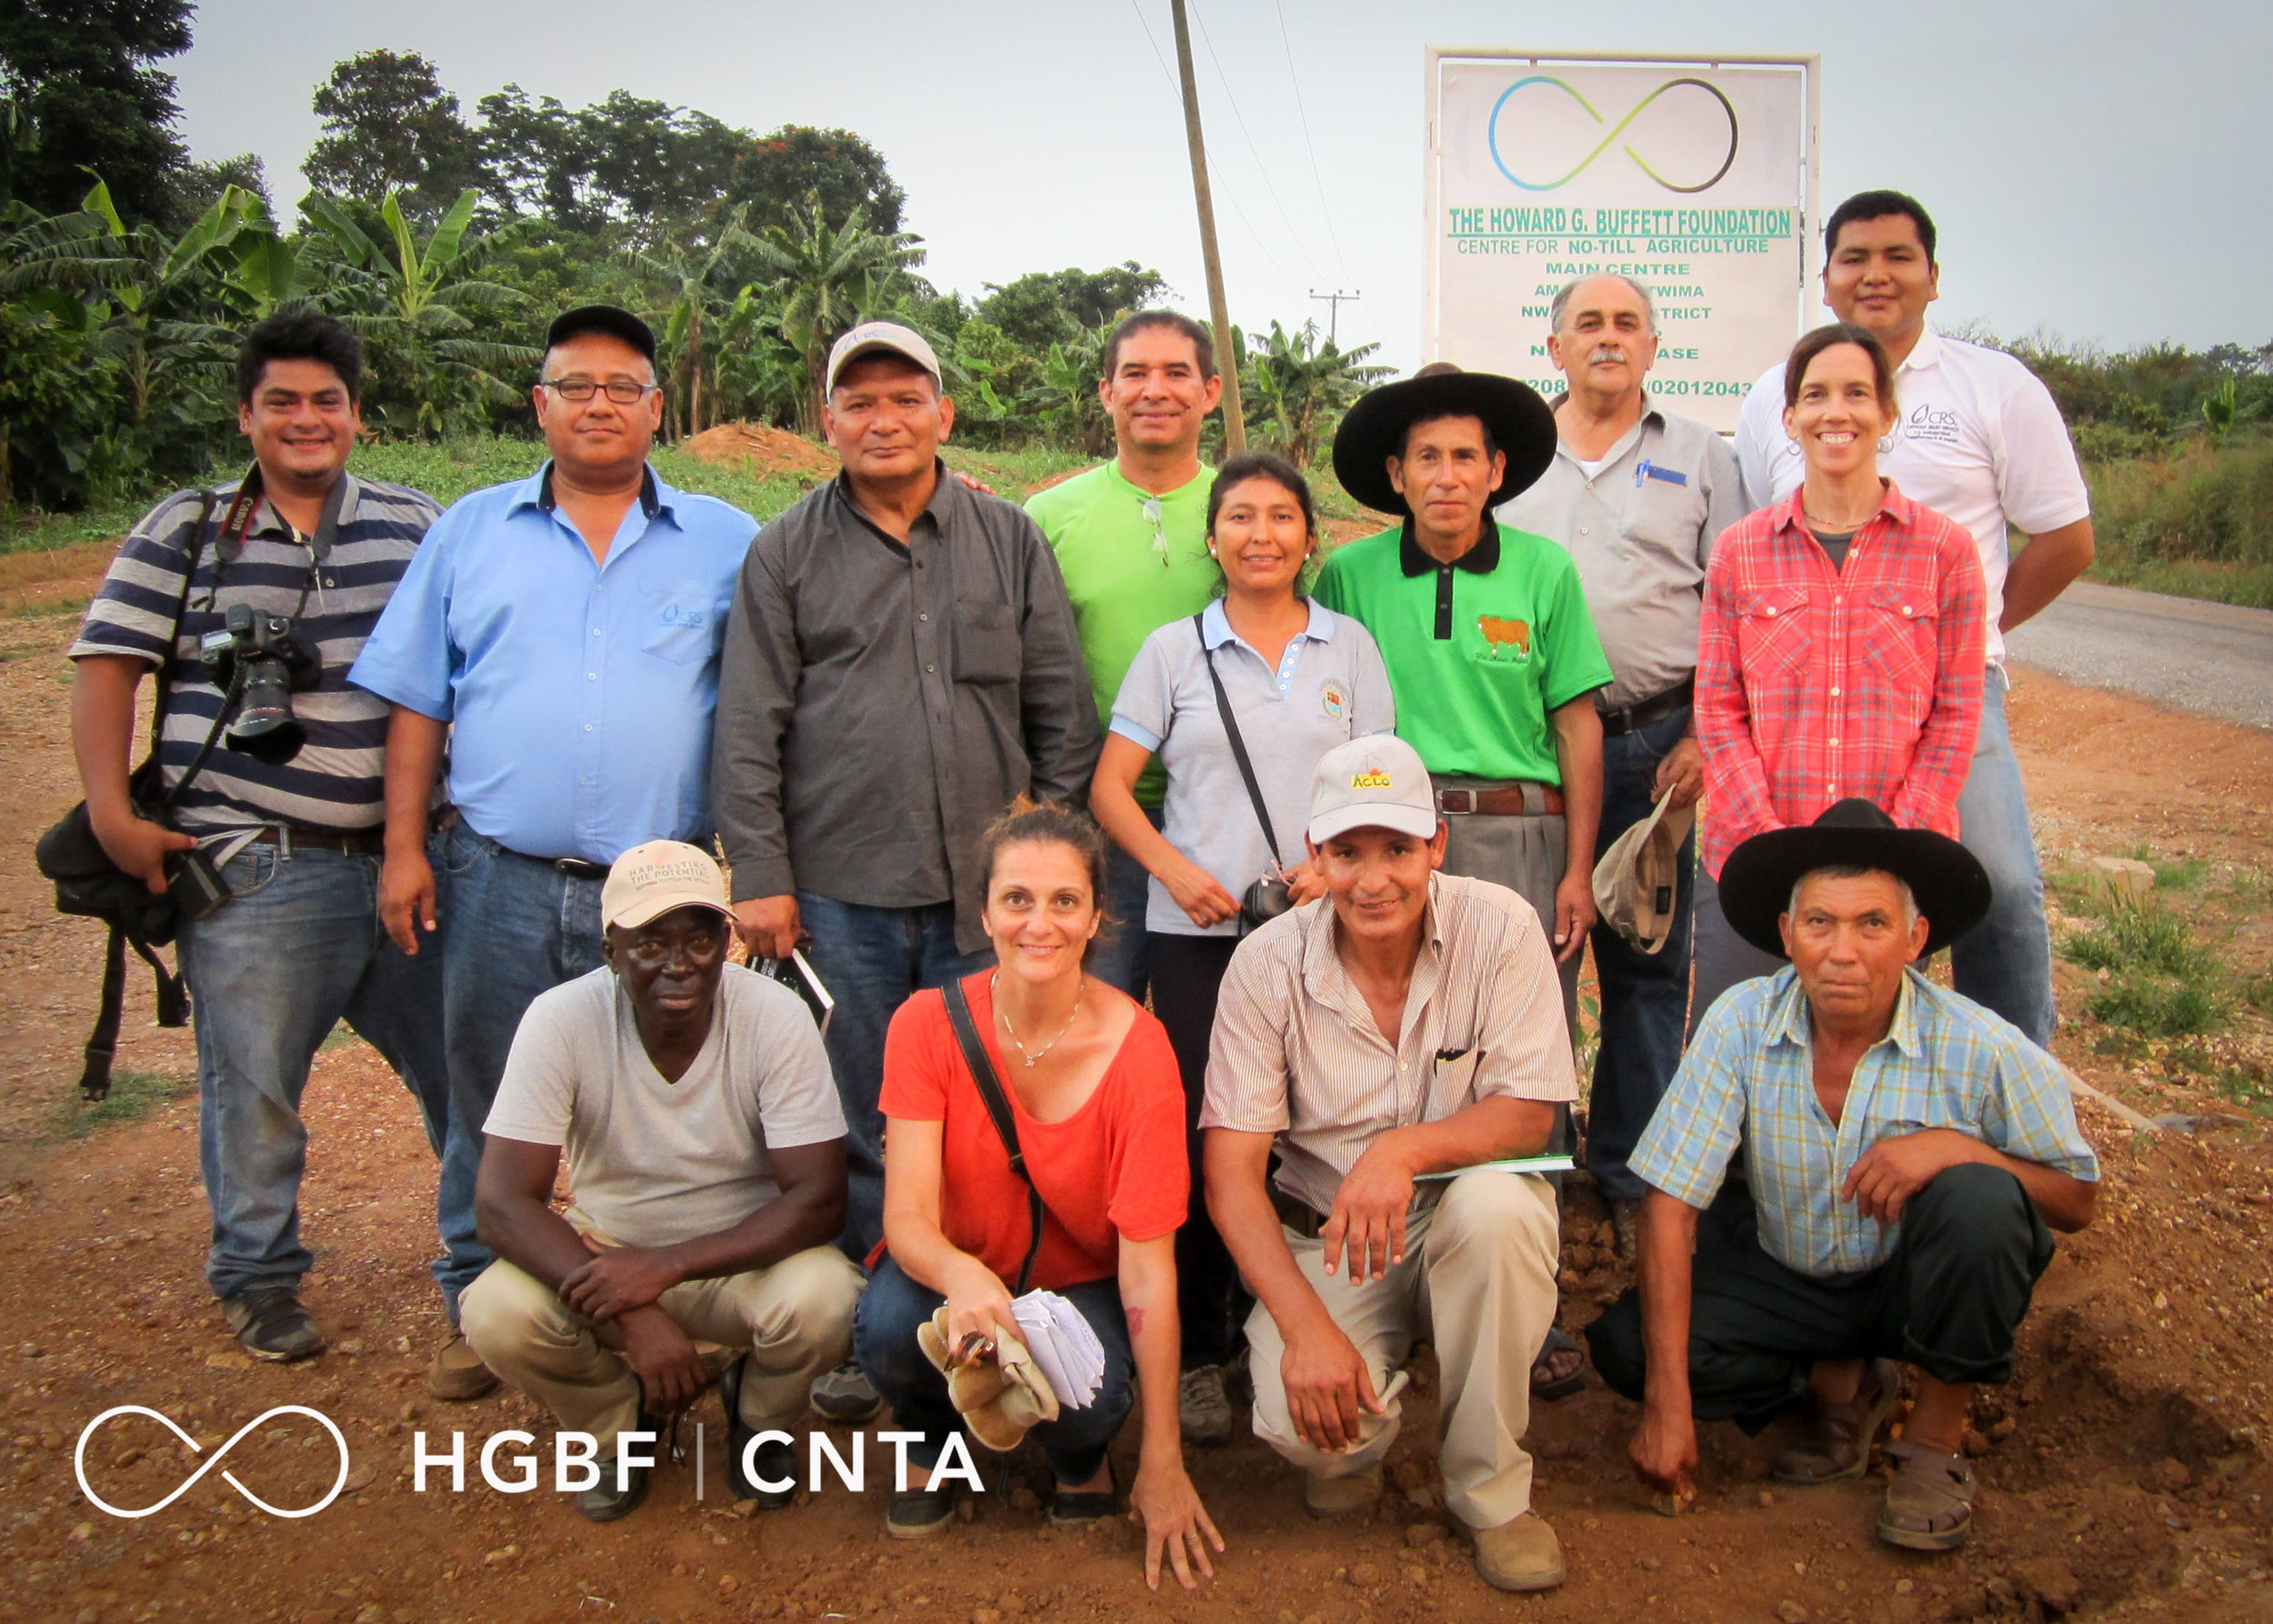 CA training for Mesoamerica Catholic Relief Services (CRS)